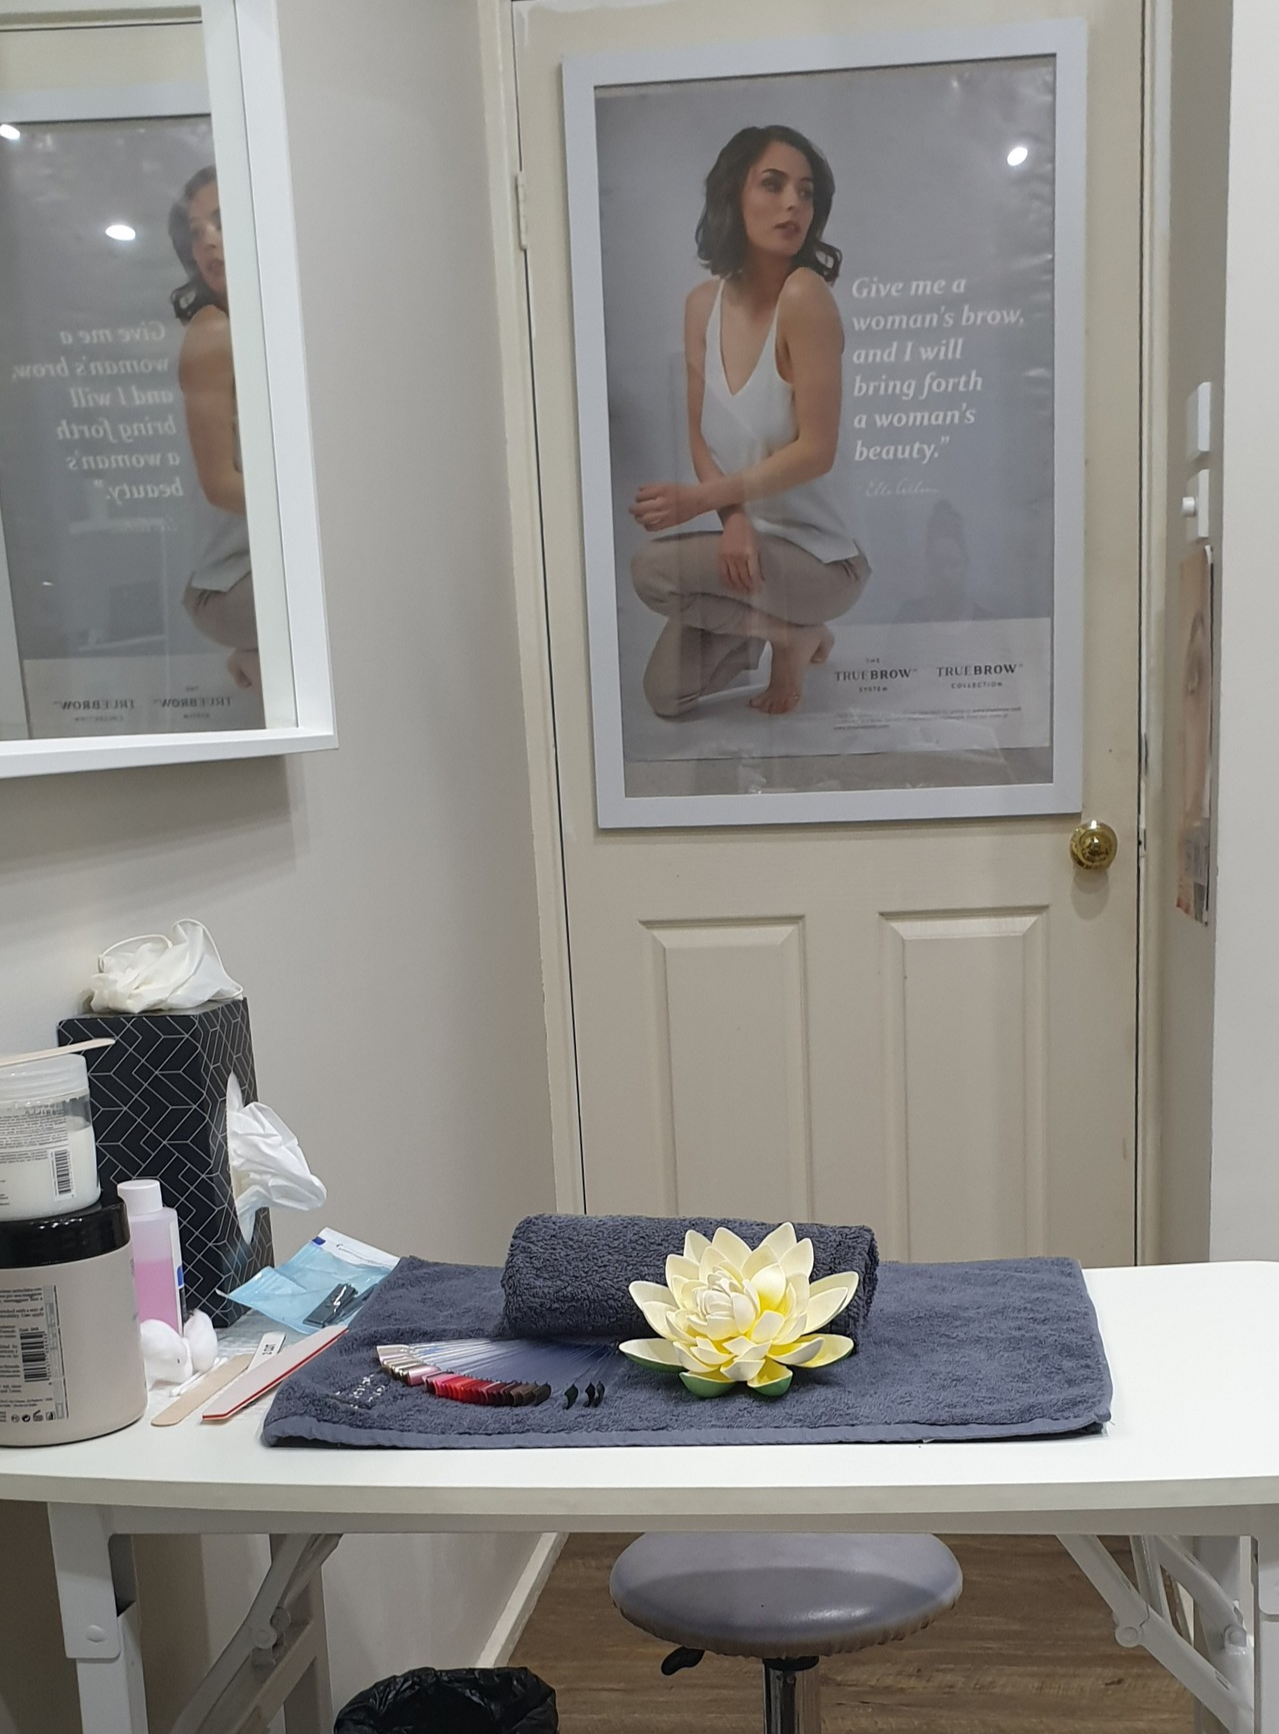 manicure beautysalonemuplains (With images) Beauty